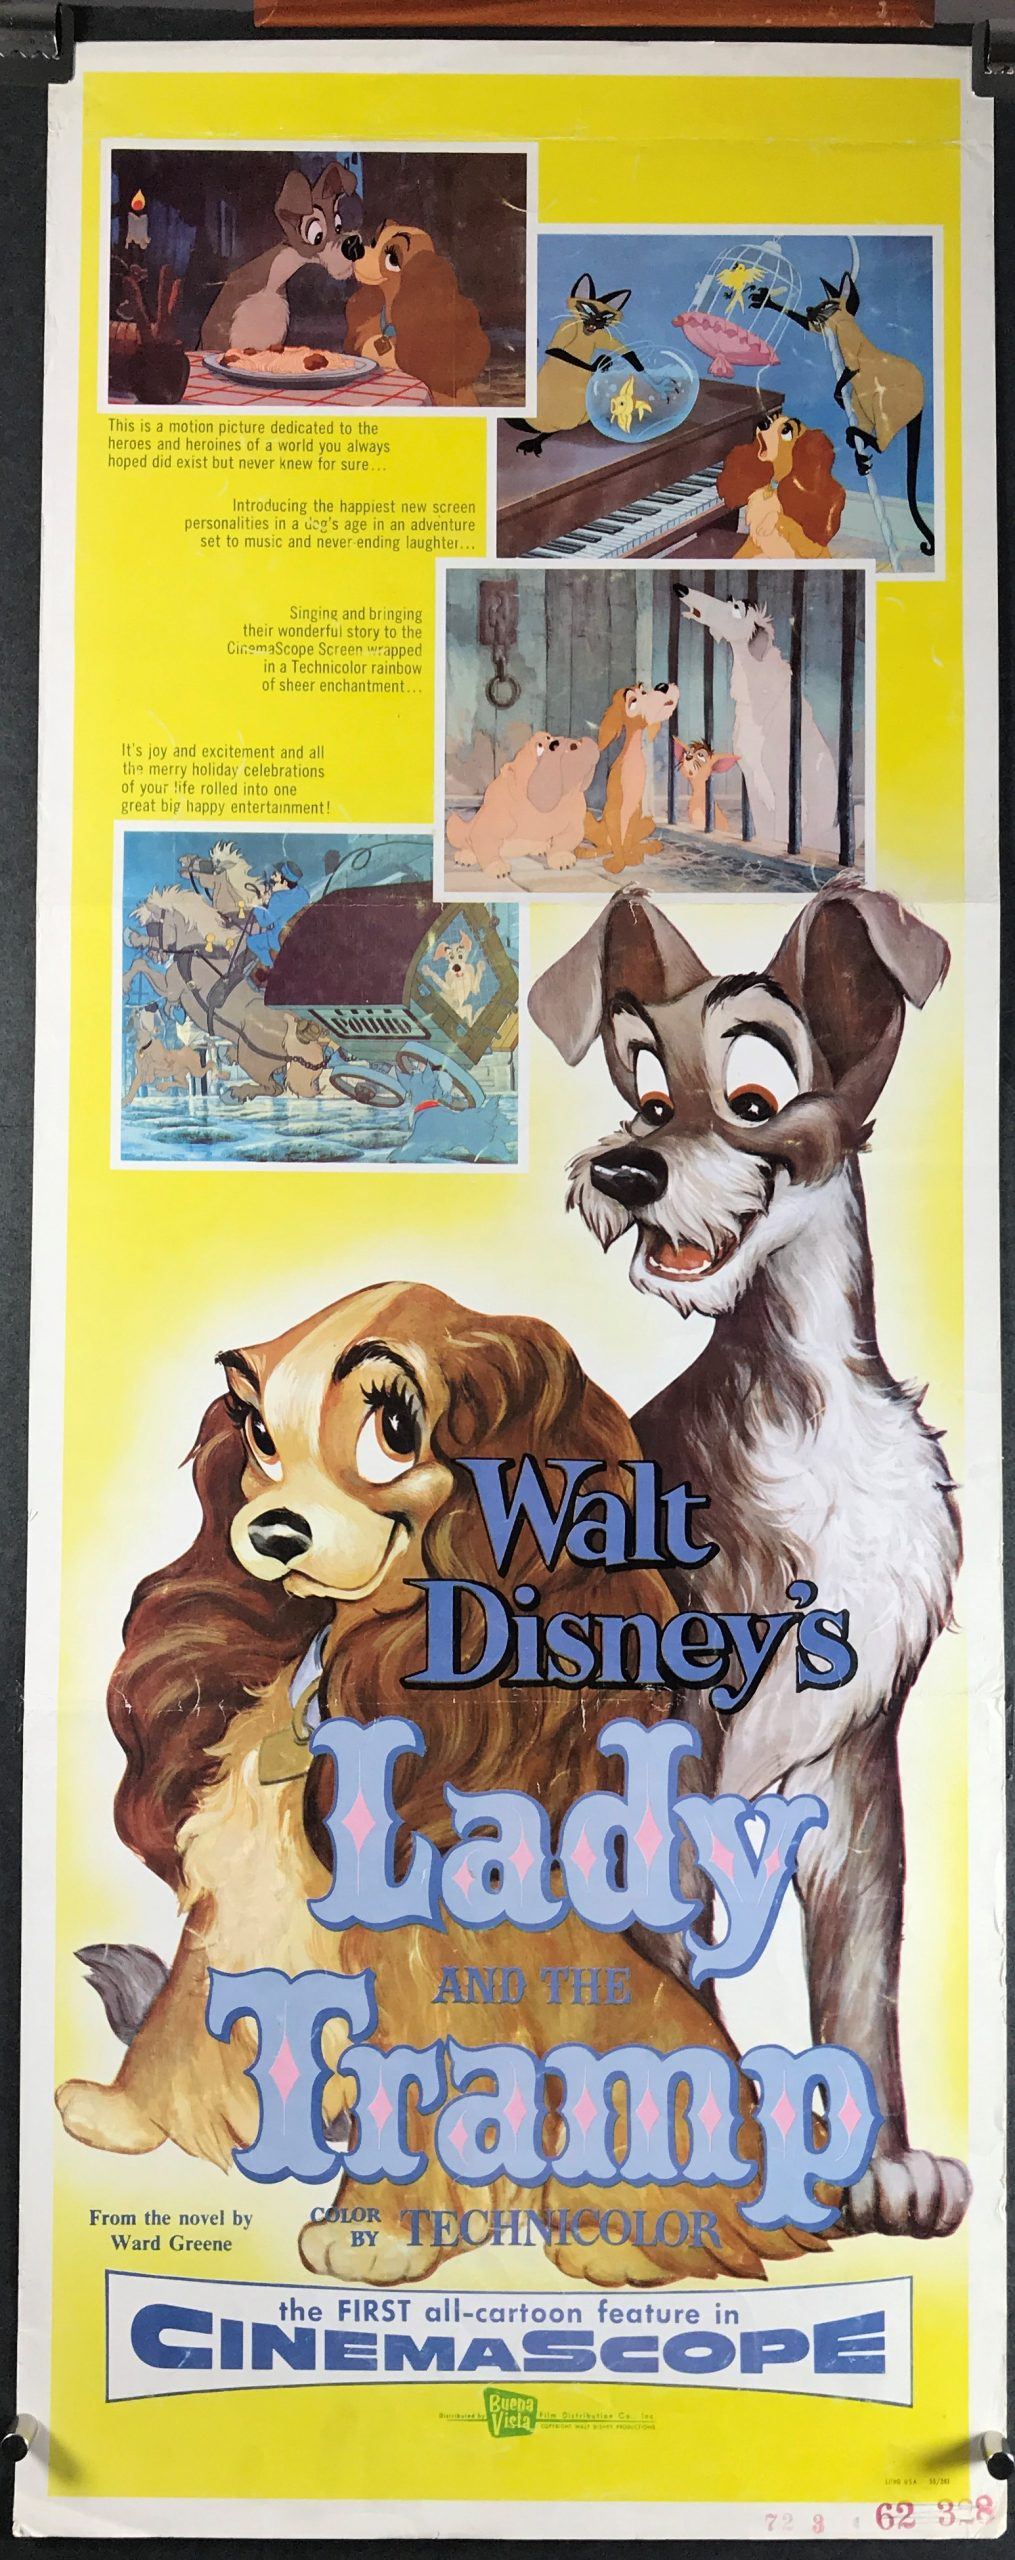 Lady And The Tramp Original Vintage Walt Disney Animated Movie Poster Original Vintage Movie Posters